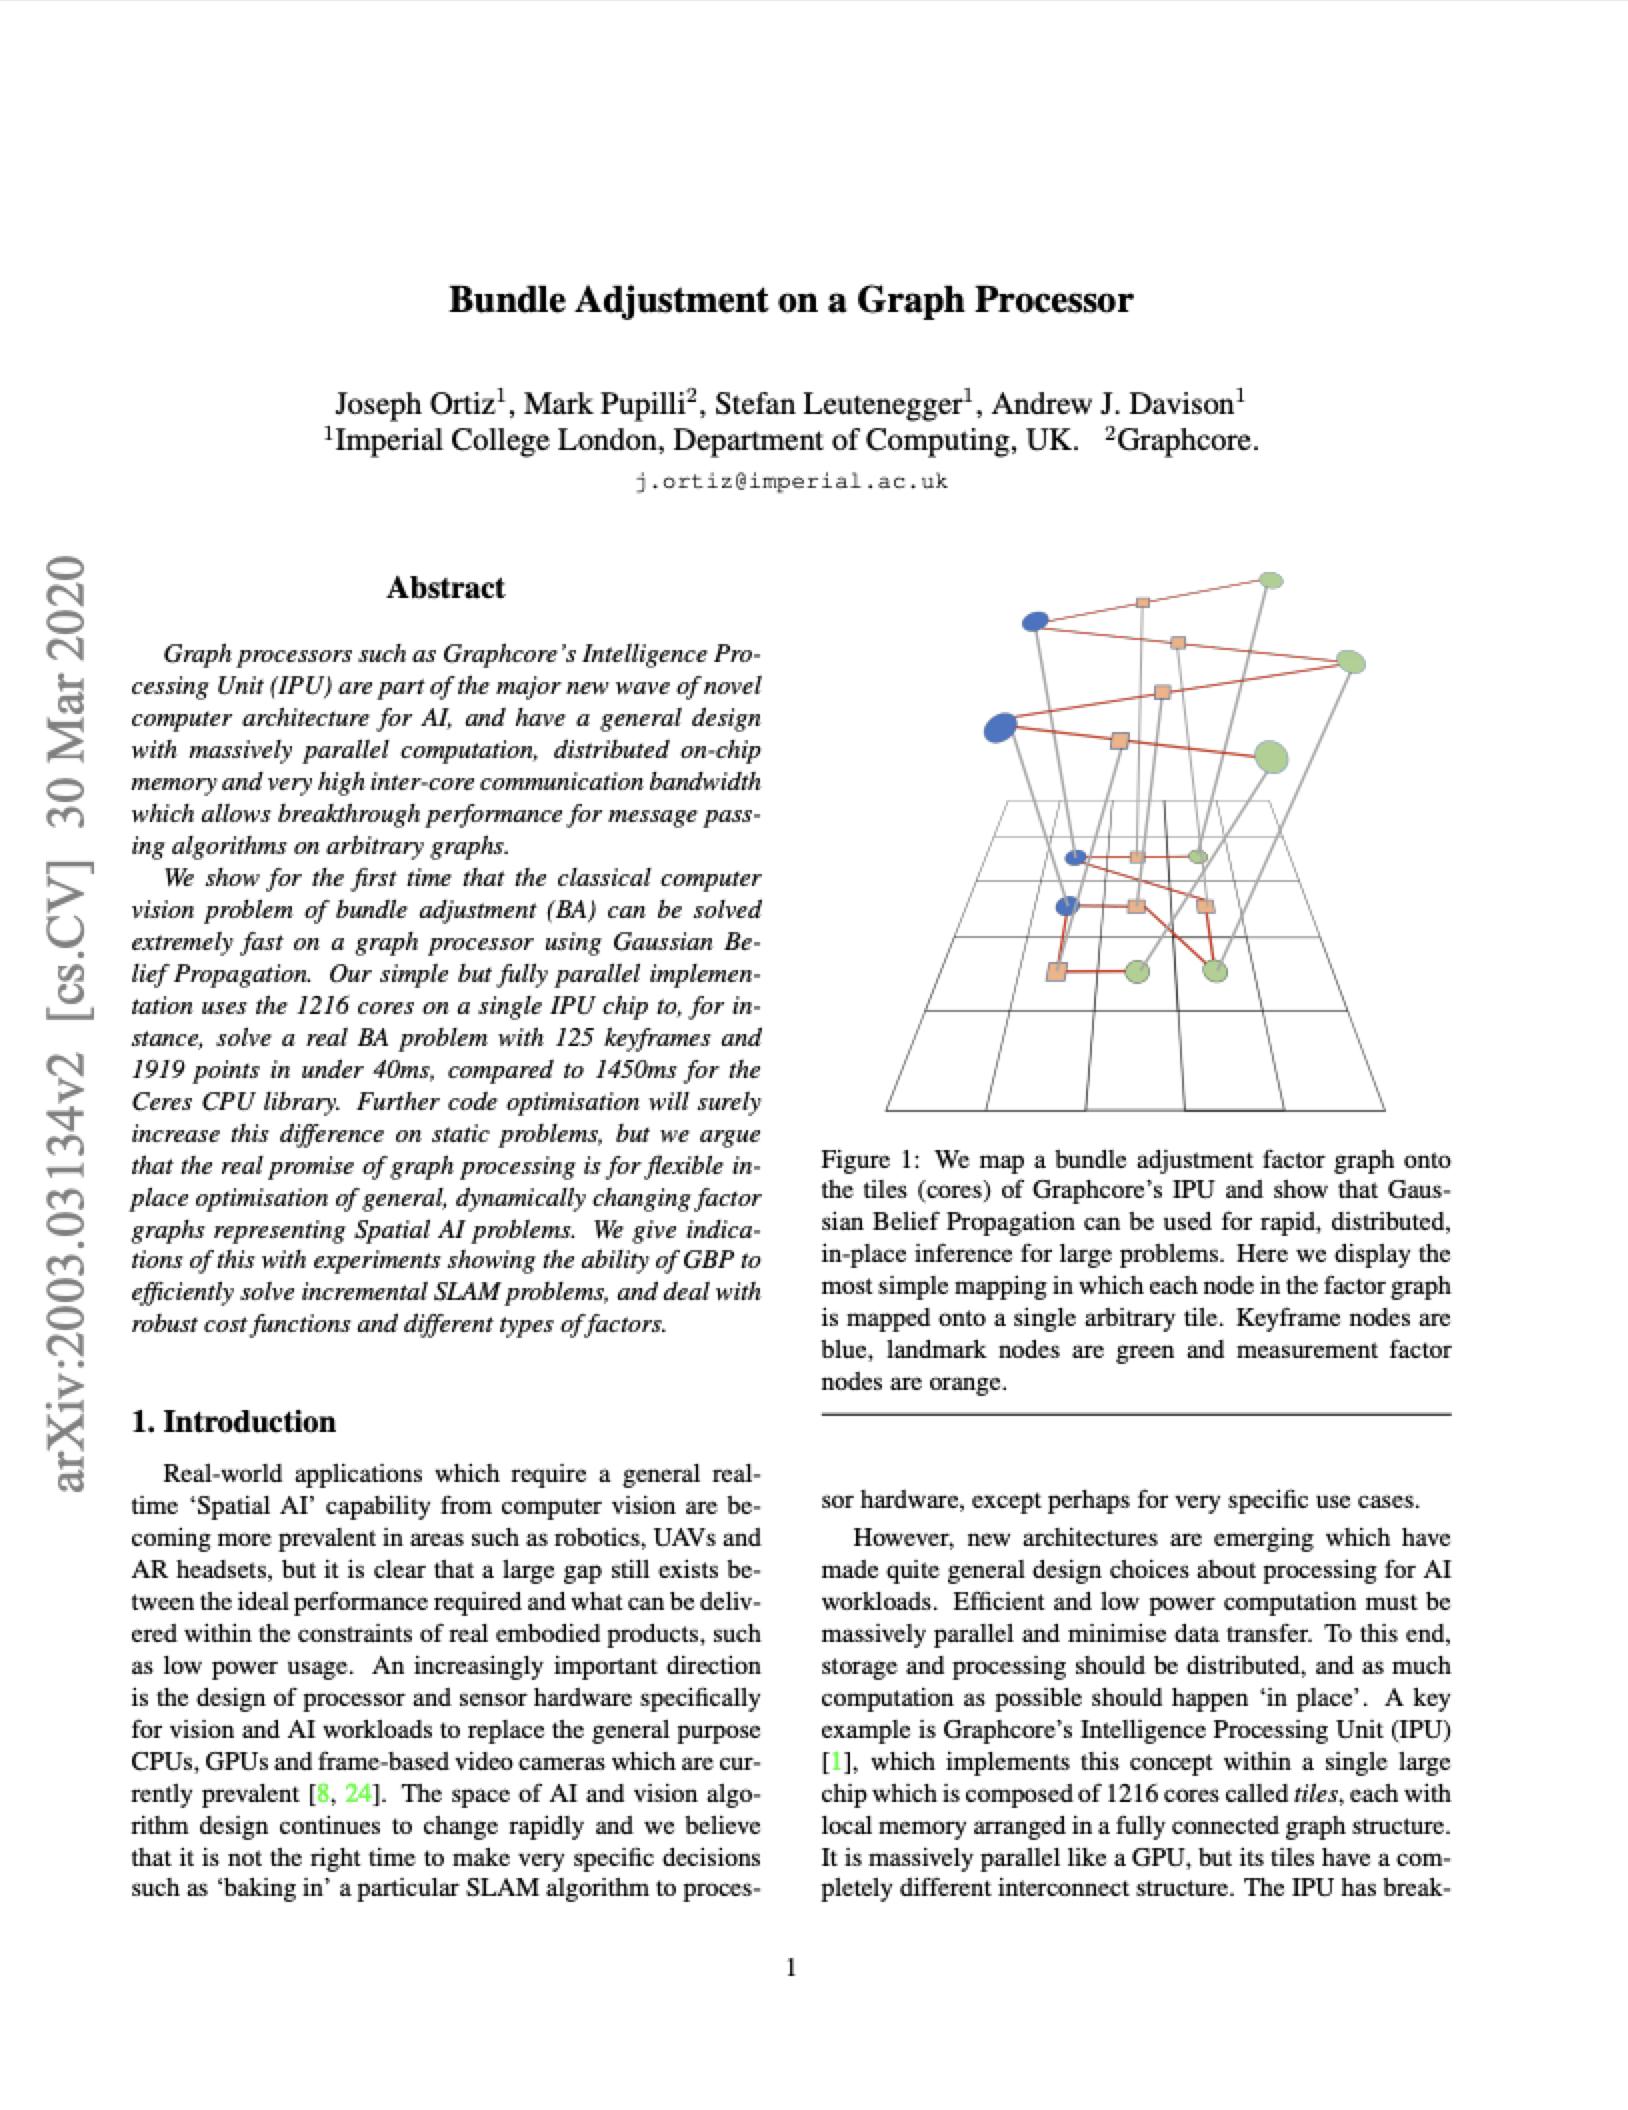 Imperial College London: Bundle Adjustment on a Graph Processor